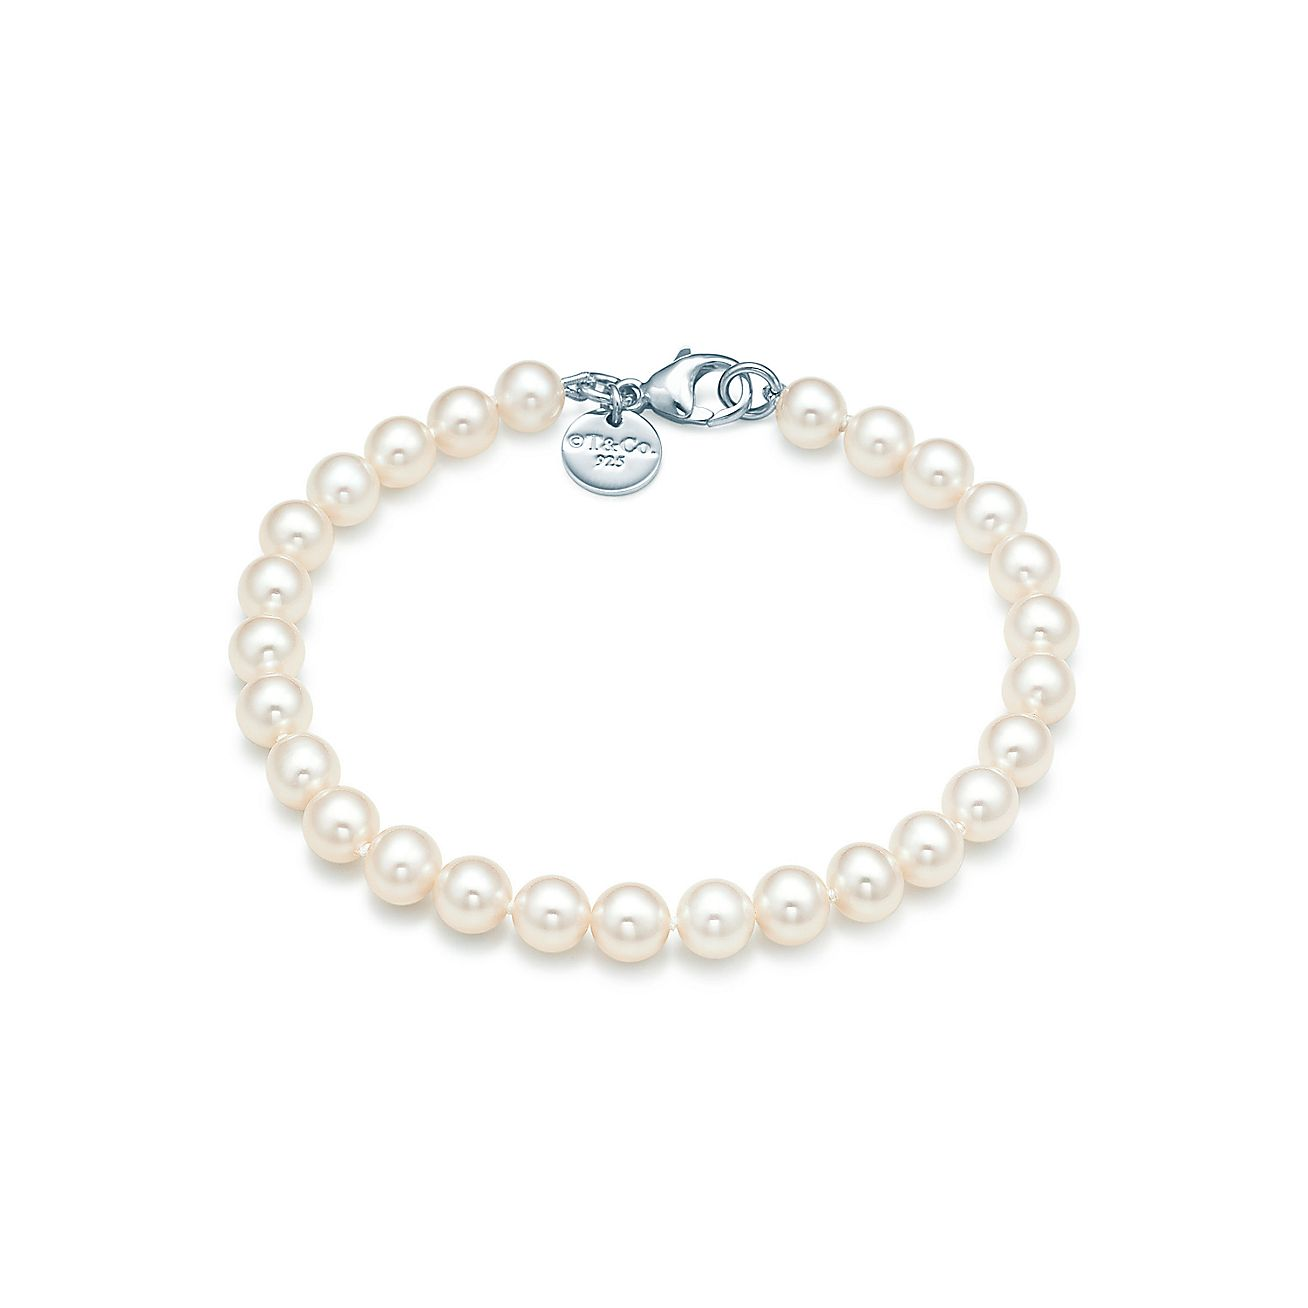 Perlenarmband  Perlenarmband mit Sterlingsilberverschluss.   Tiffany & Co.